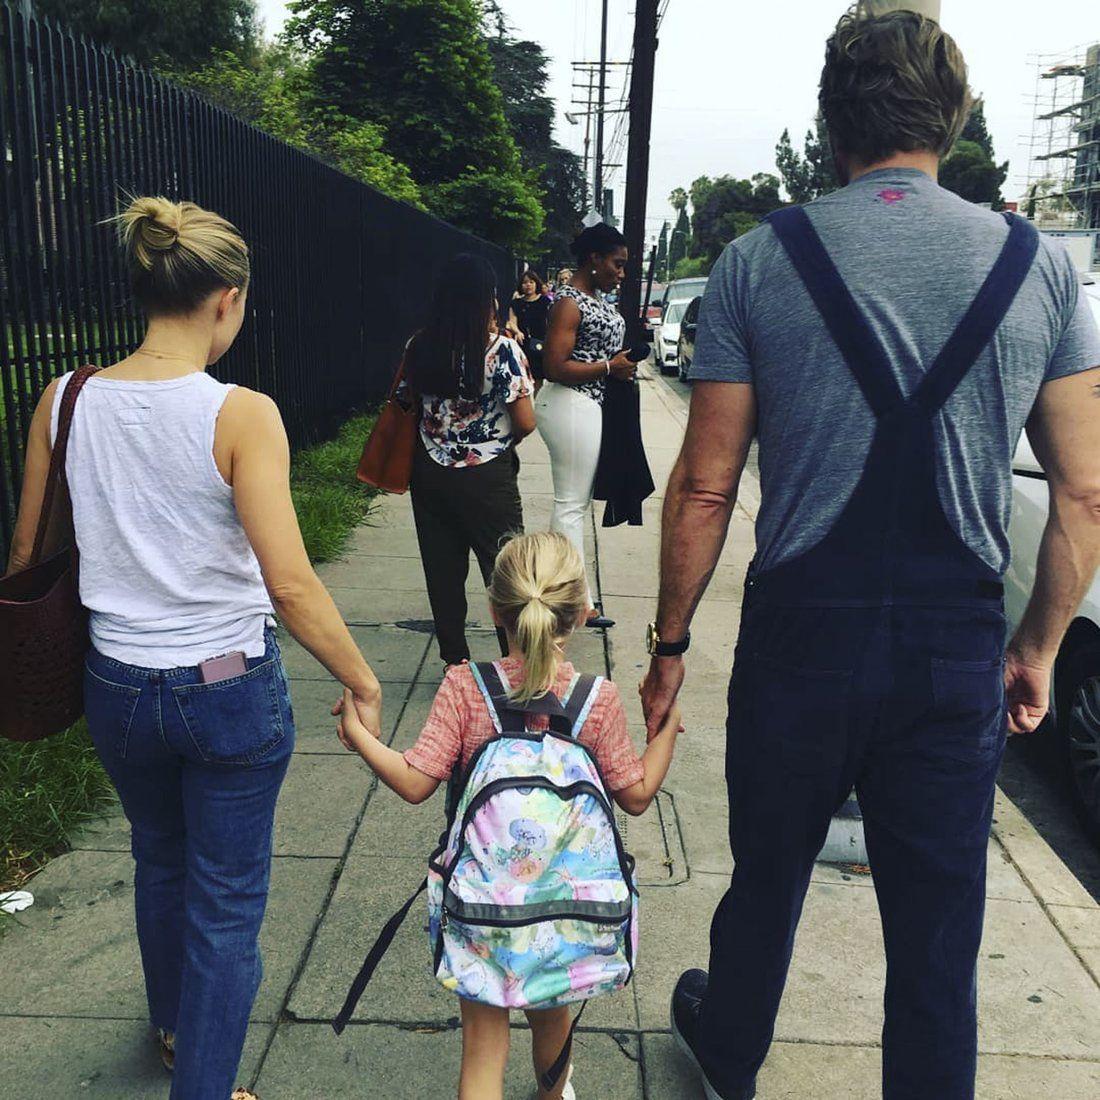 Kristen Bell And Dax Shepard Walk Daughter Lincoln To School During First Week Of Kindergarten Kristen Bell And Dax Kristen Bell Dax Shepard